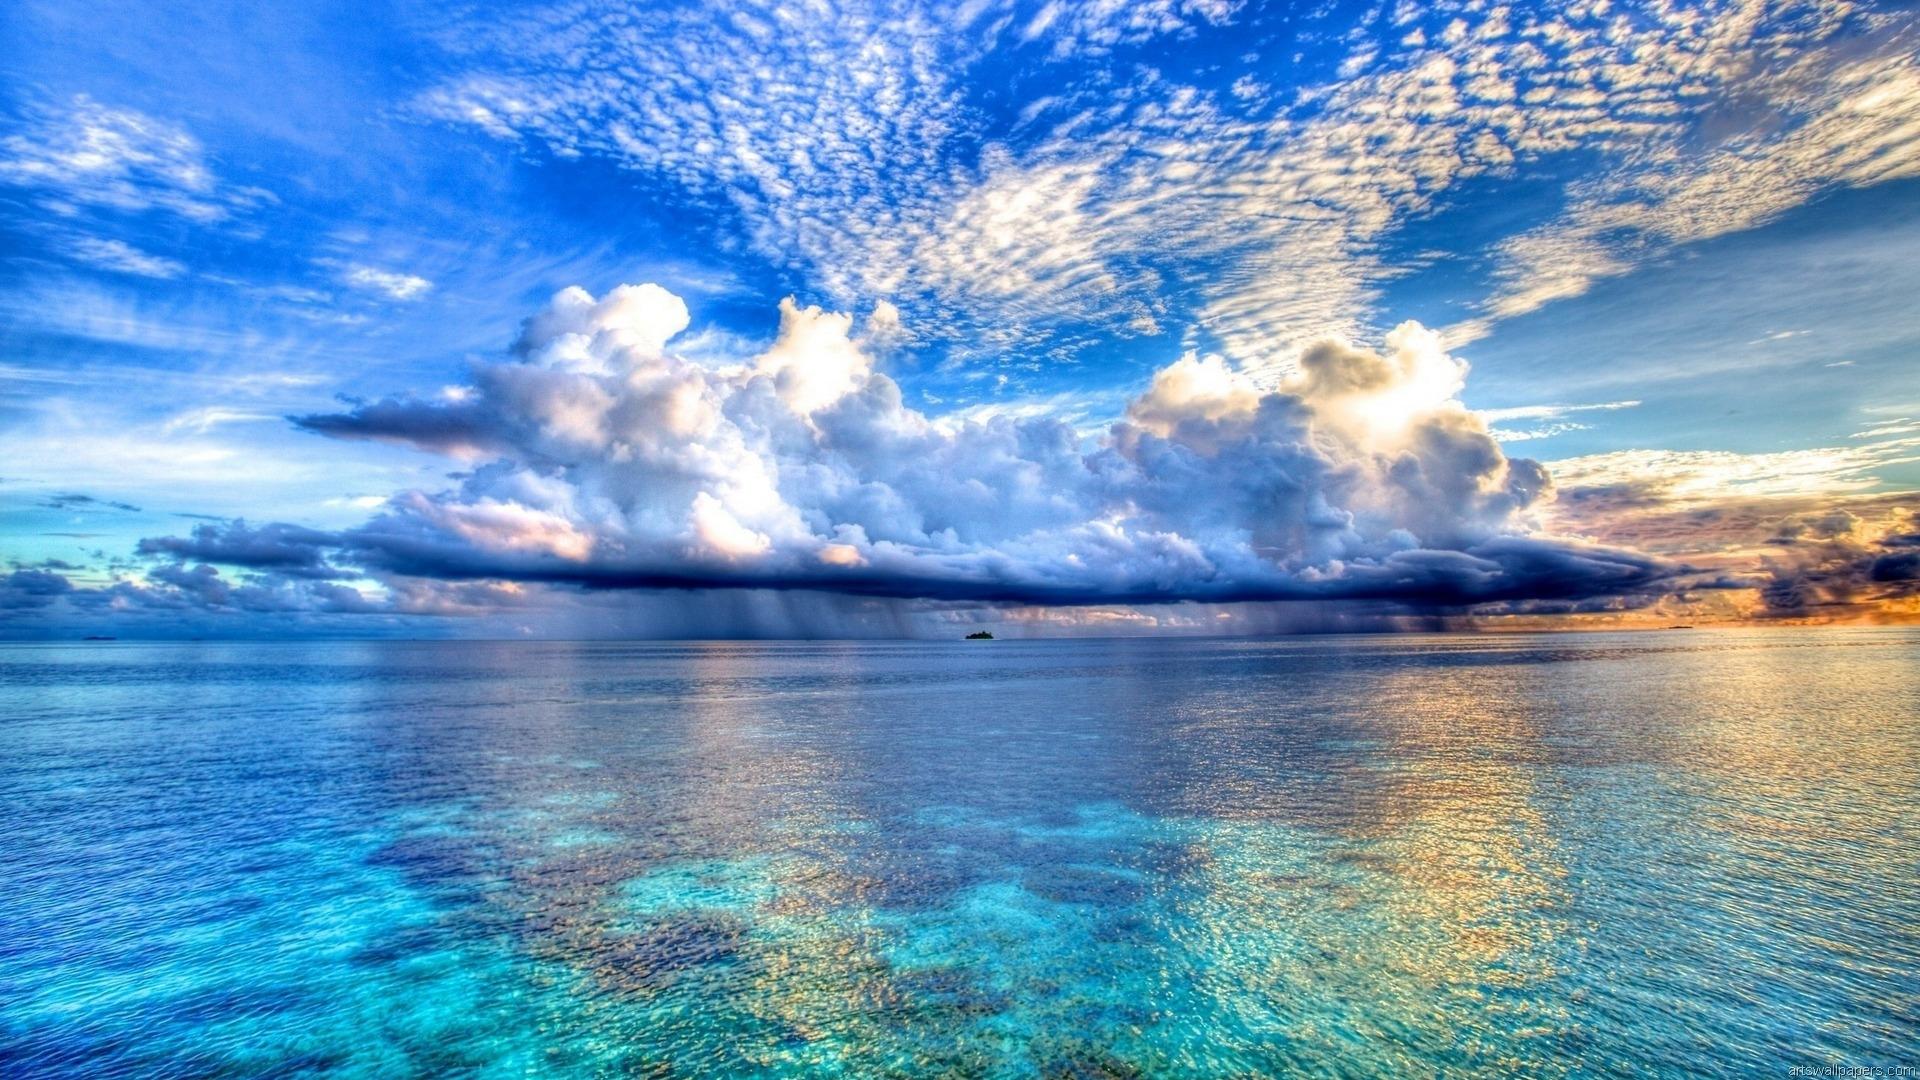 Sea Ocean Wallpaper HD Full HD 1080p Desktop Wallpaper Background 1920x1080